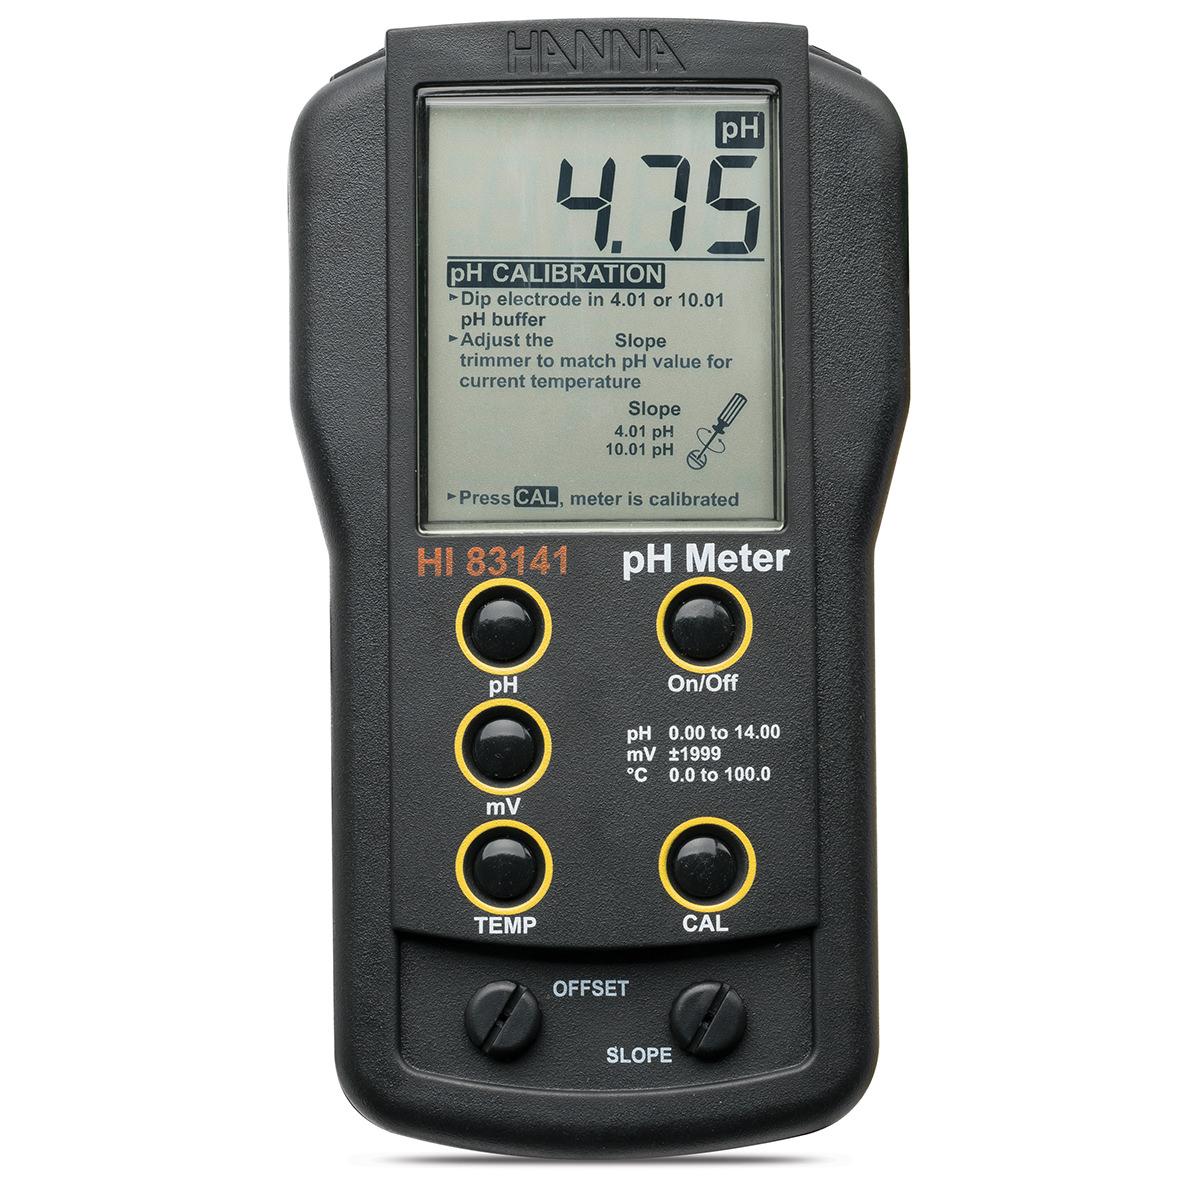 HI83141 portable pH/mV meter